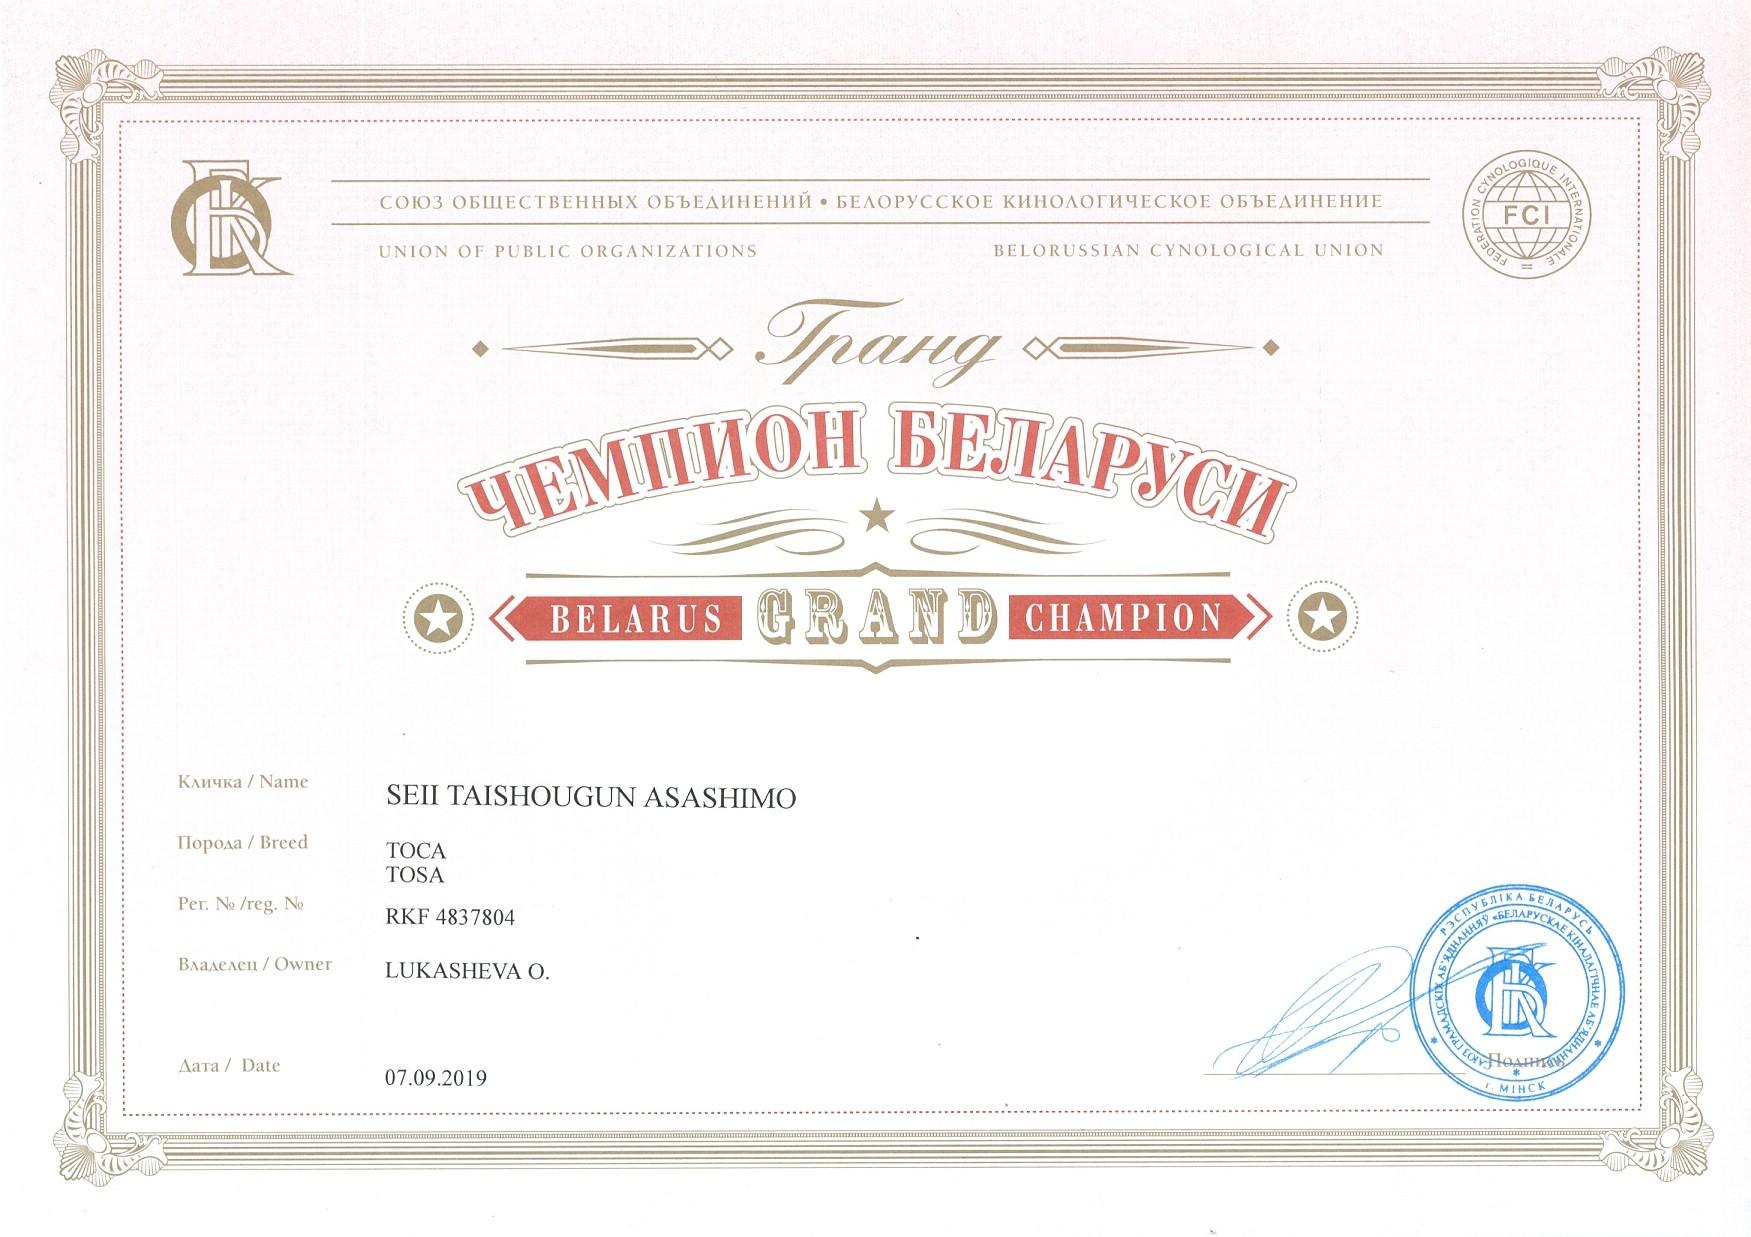 Шон Гранд Беларуси